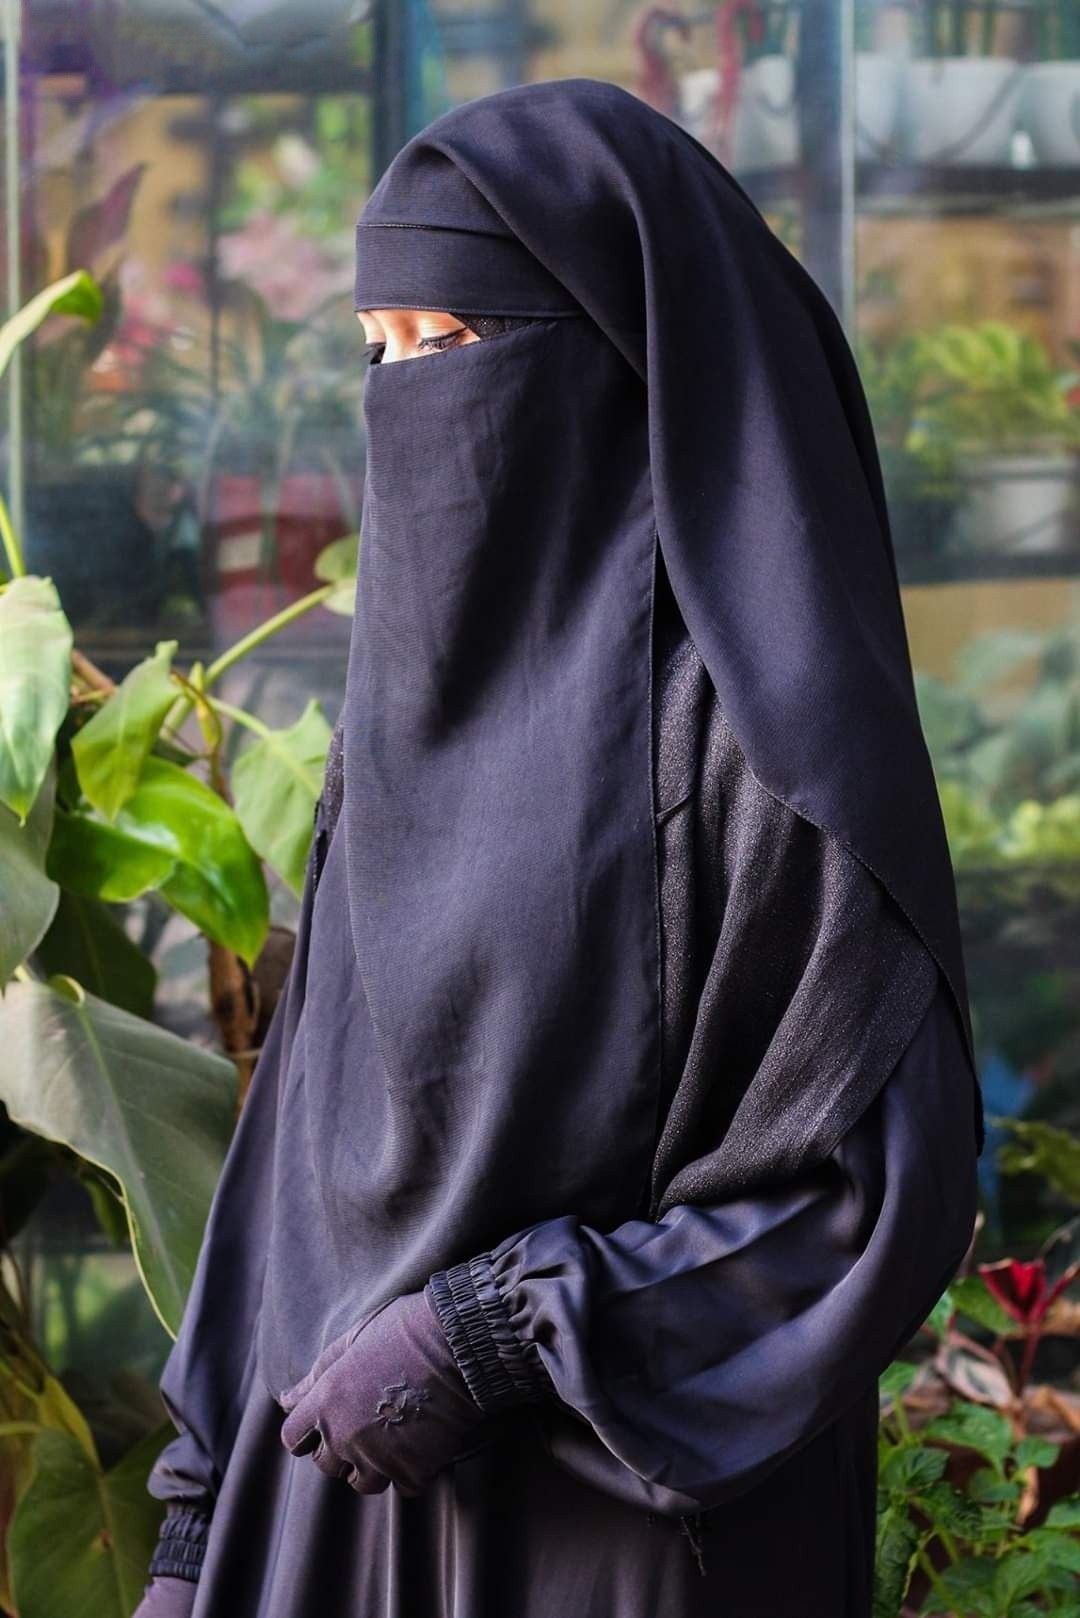 Pin by Nadirsha Hussain on Elegant | Hijab fashion